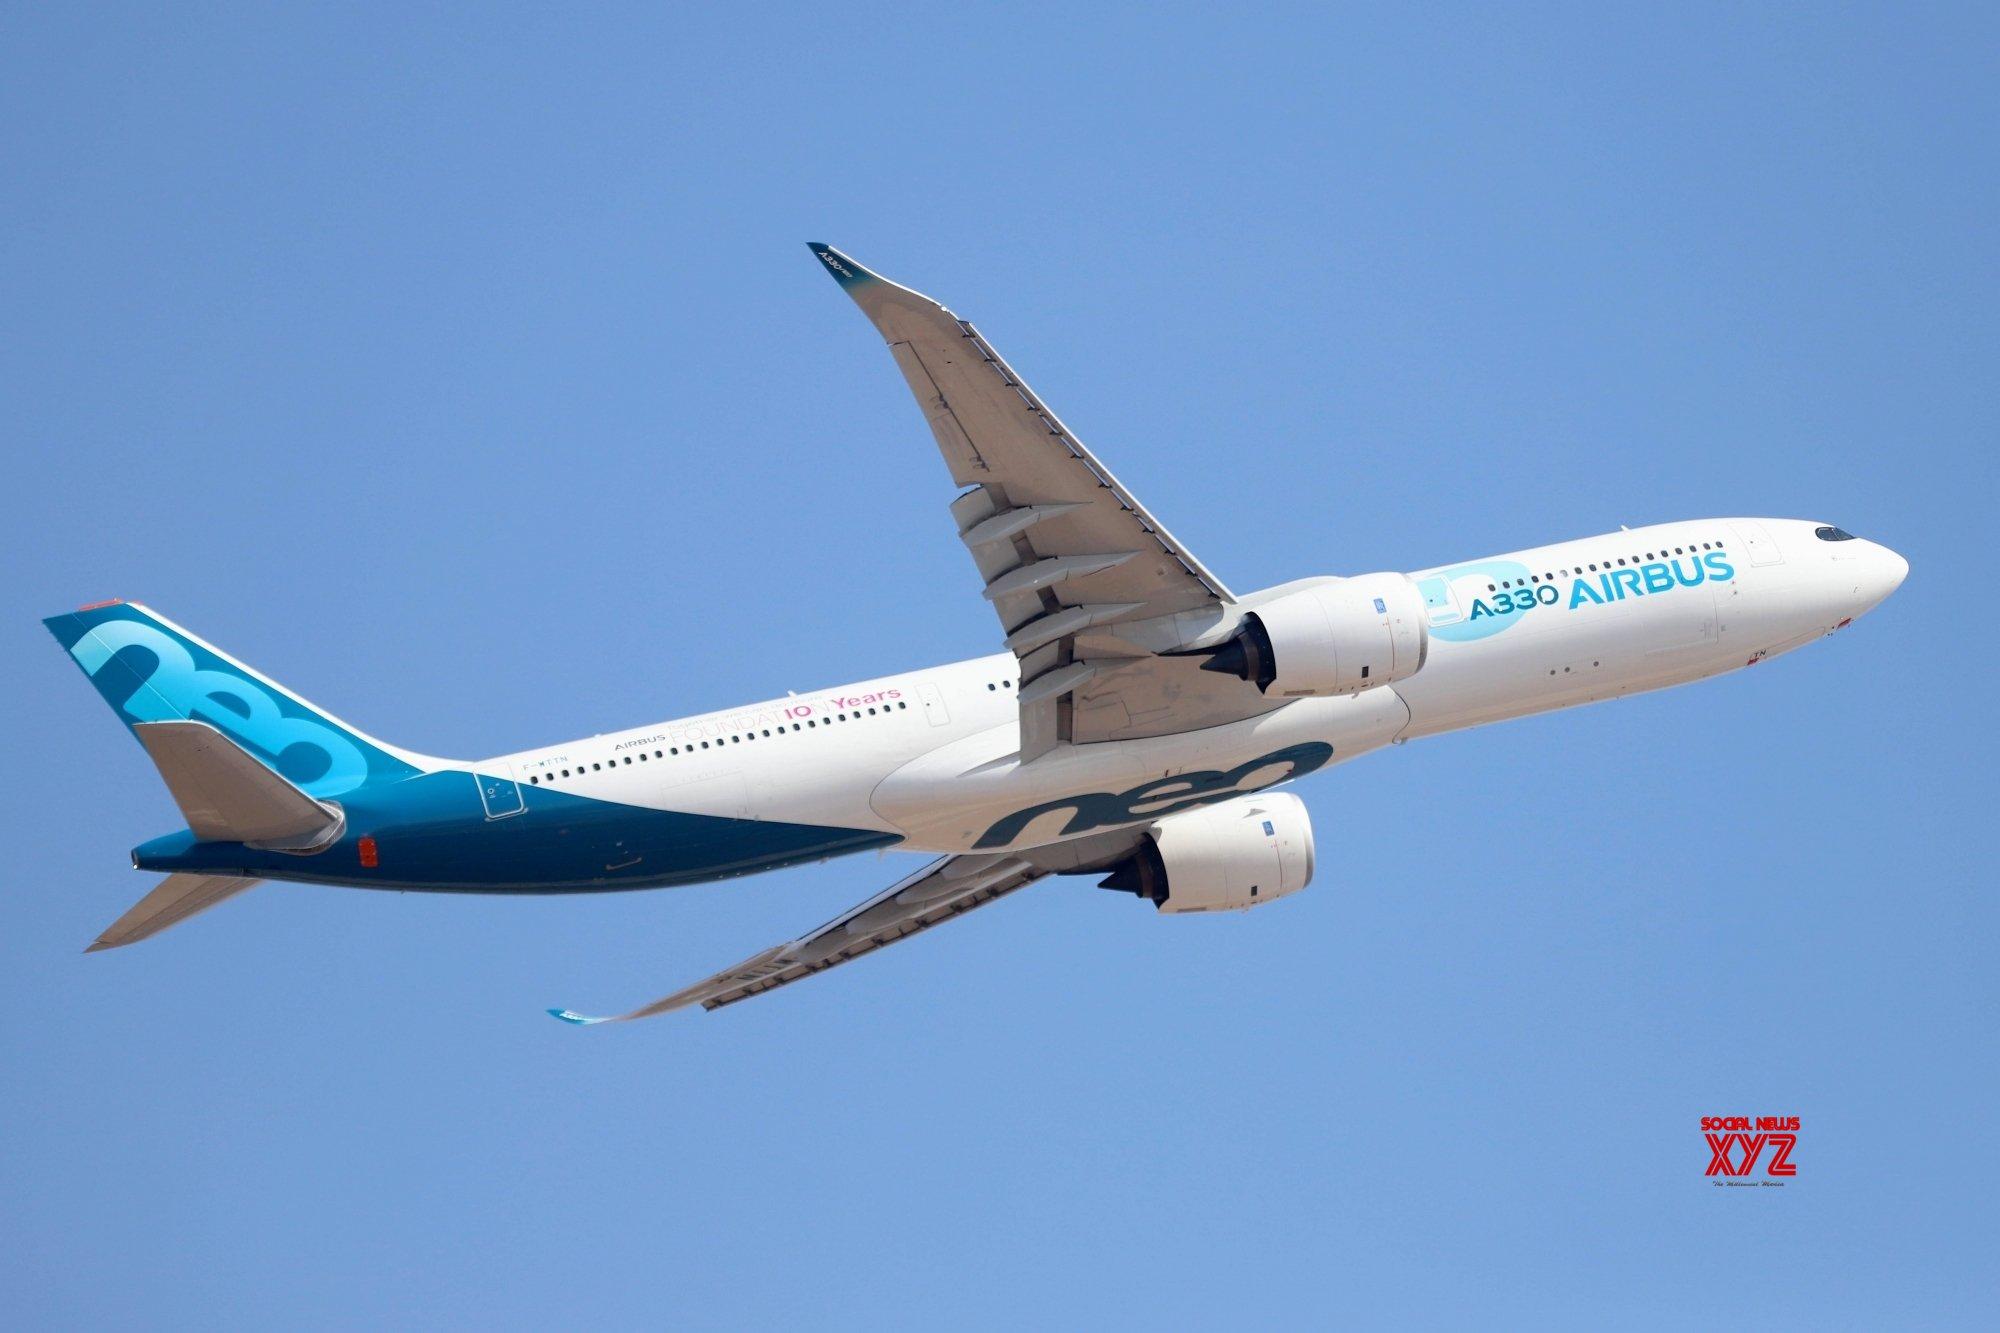 US says it will hike tariffs on European aircraft